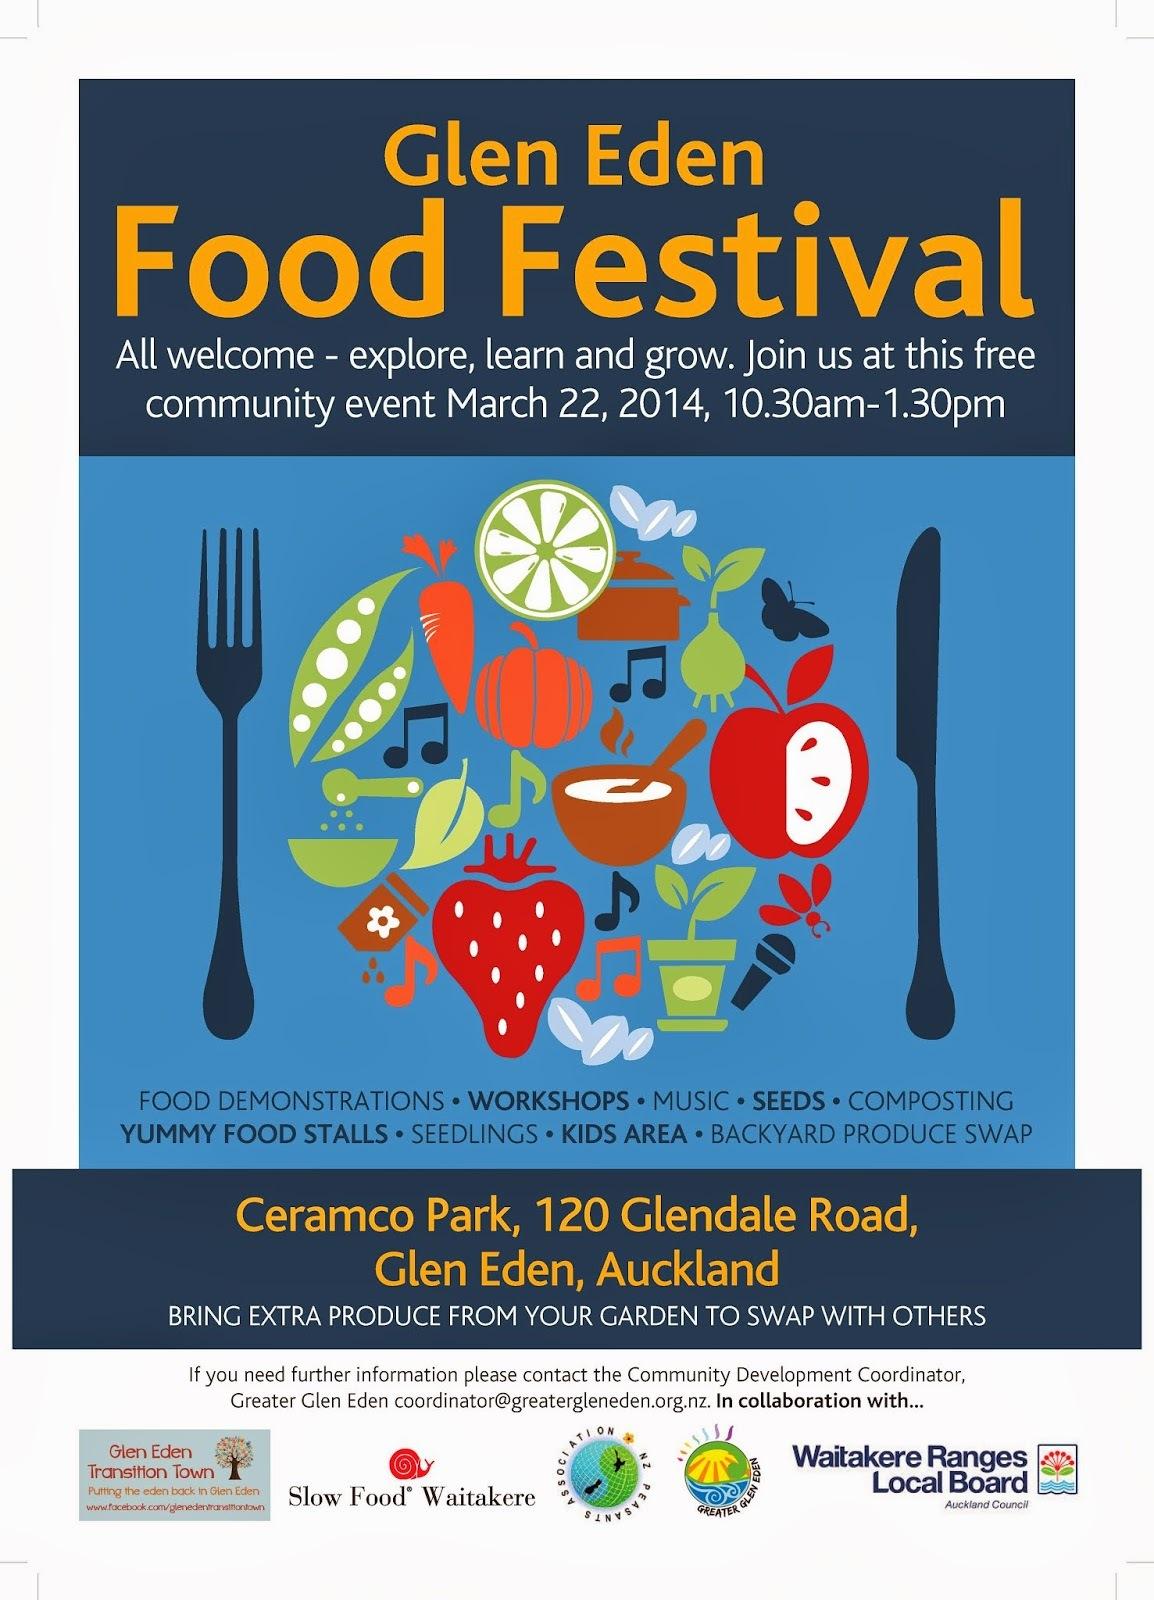 Next Saturday in Auckland: Glen Eden Food Festival, Free Entry